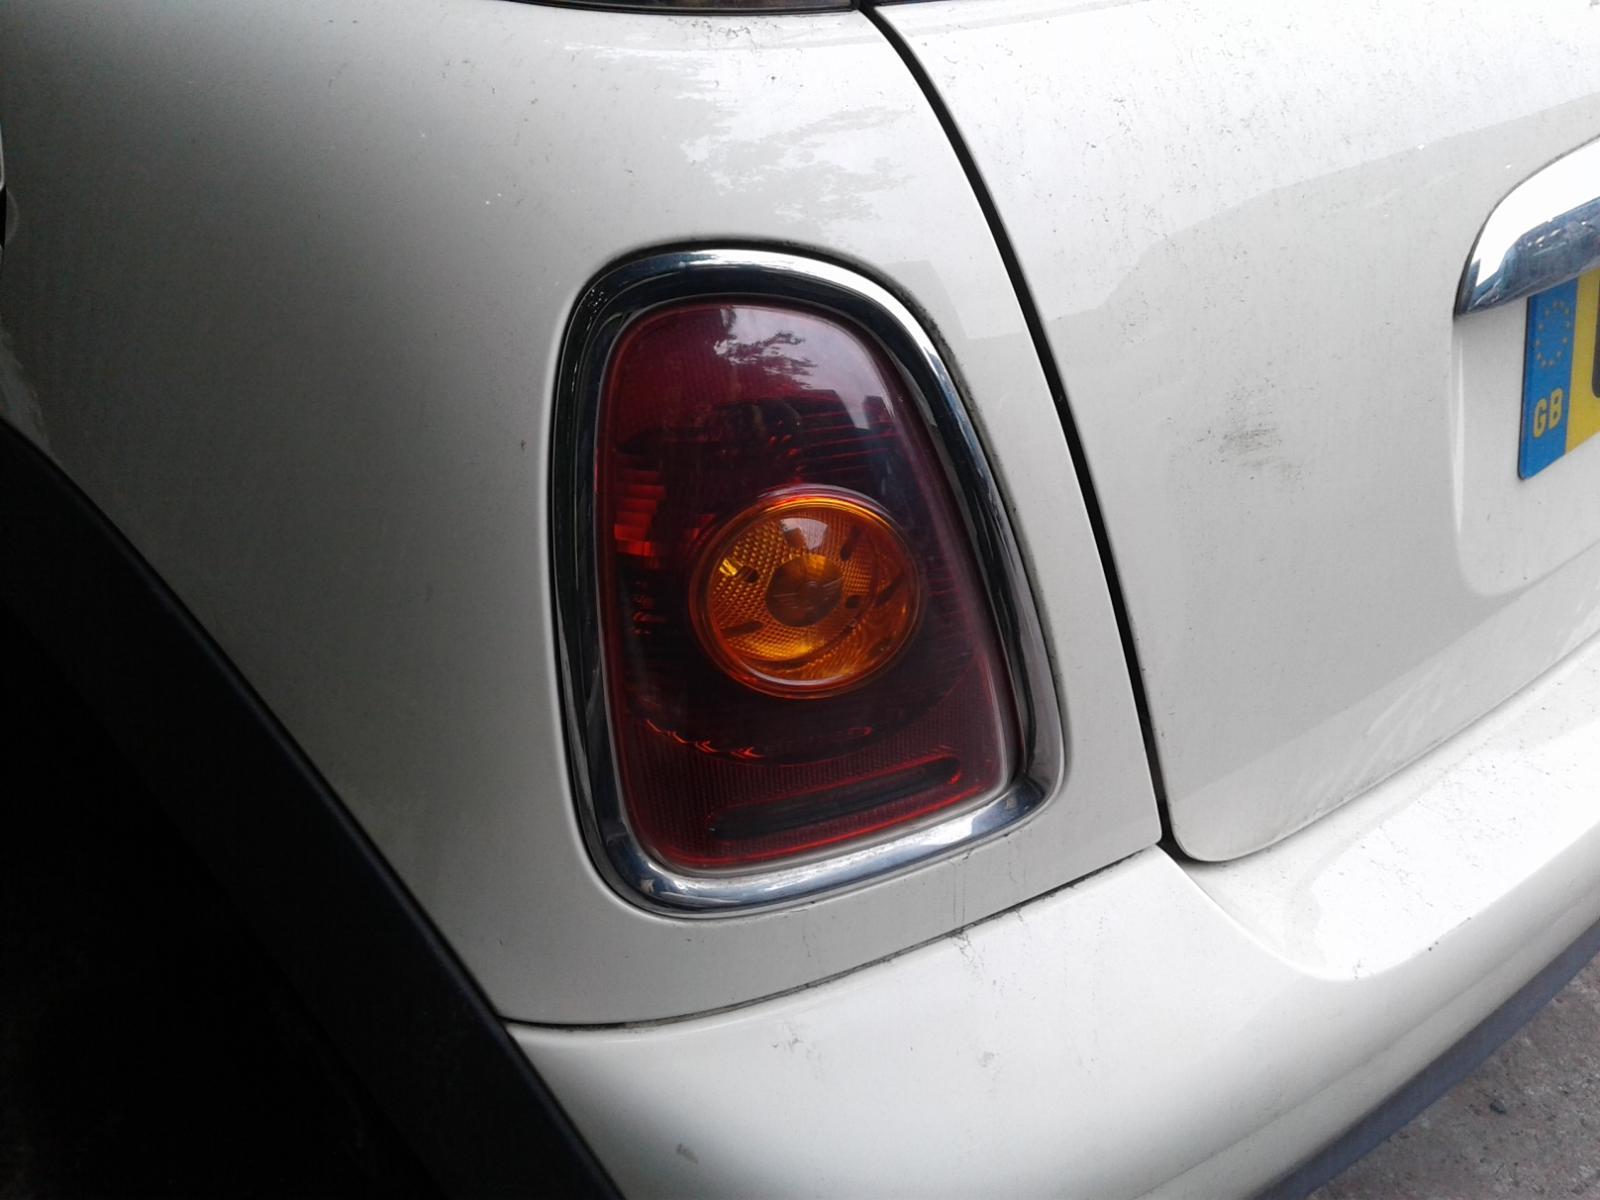 View Auto part MINI (BMW) MINI 2009 3 Door Hatchback